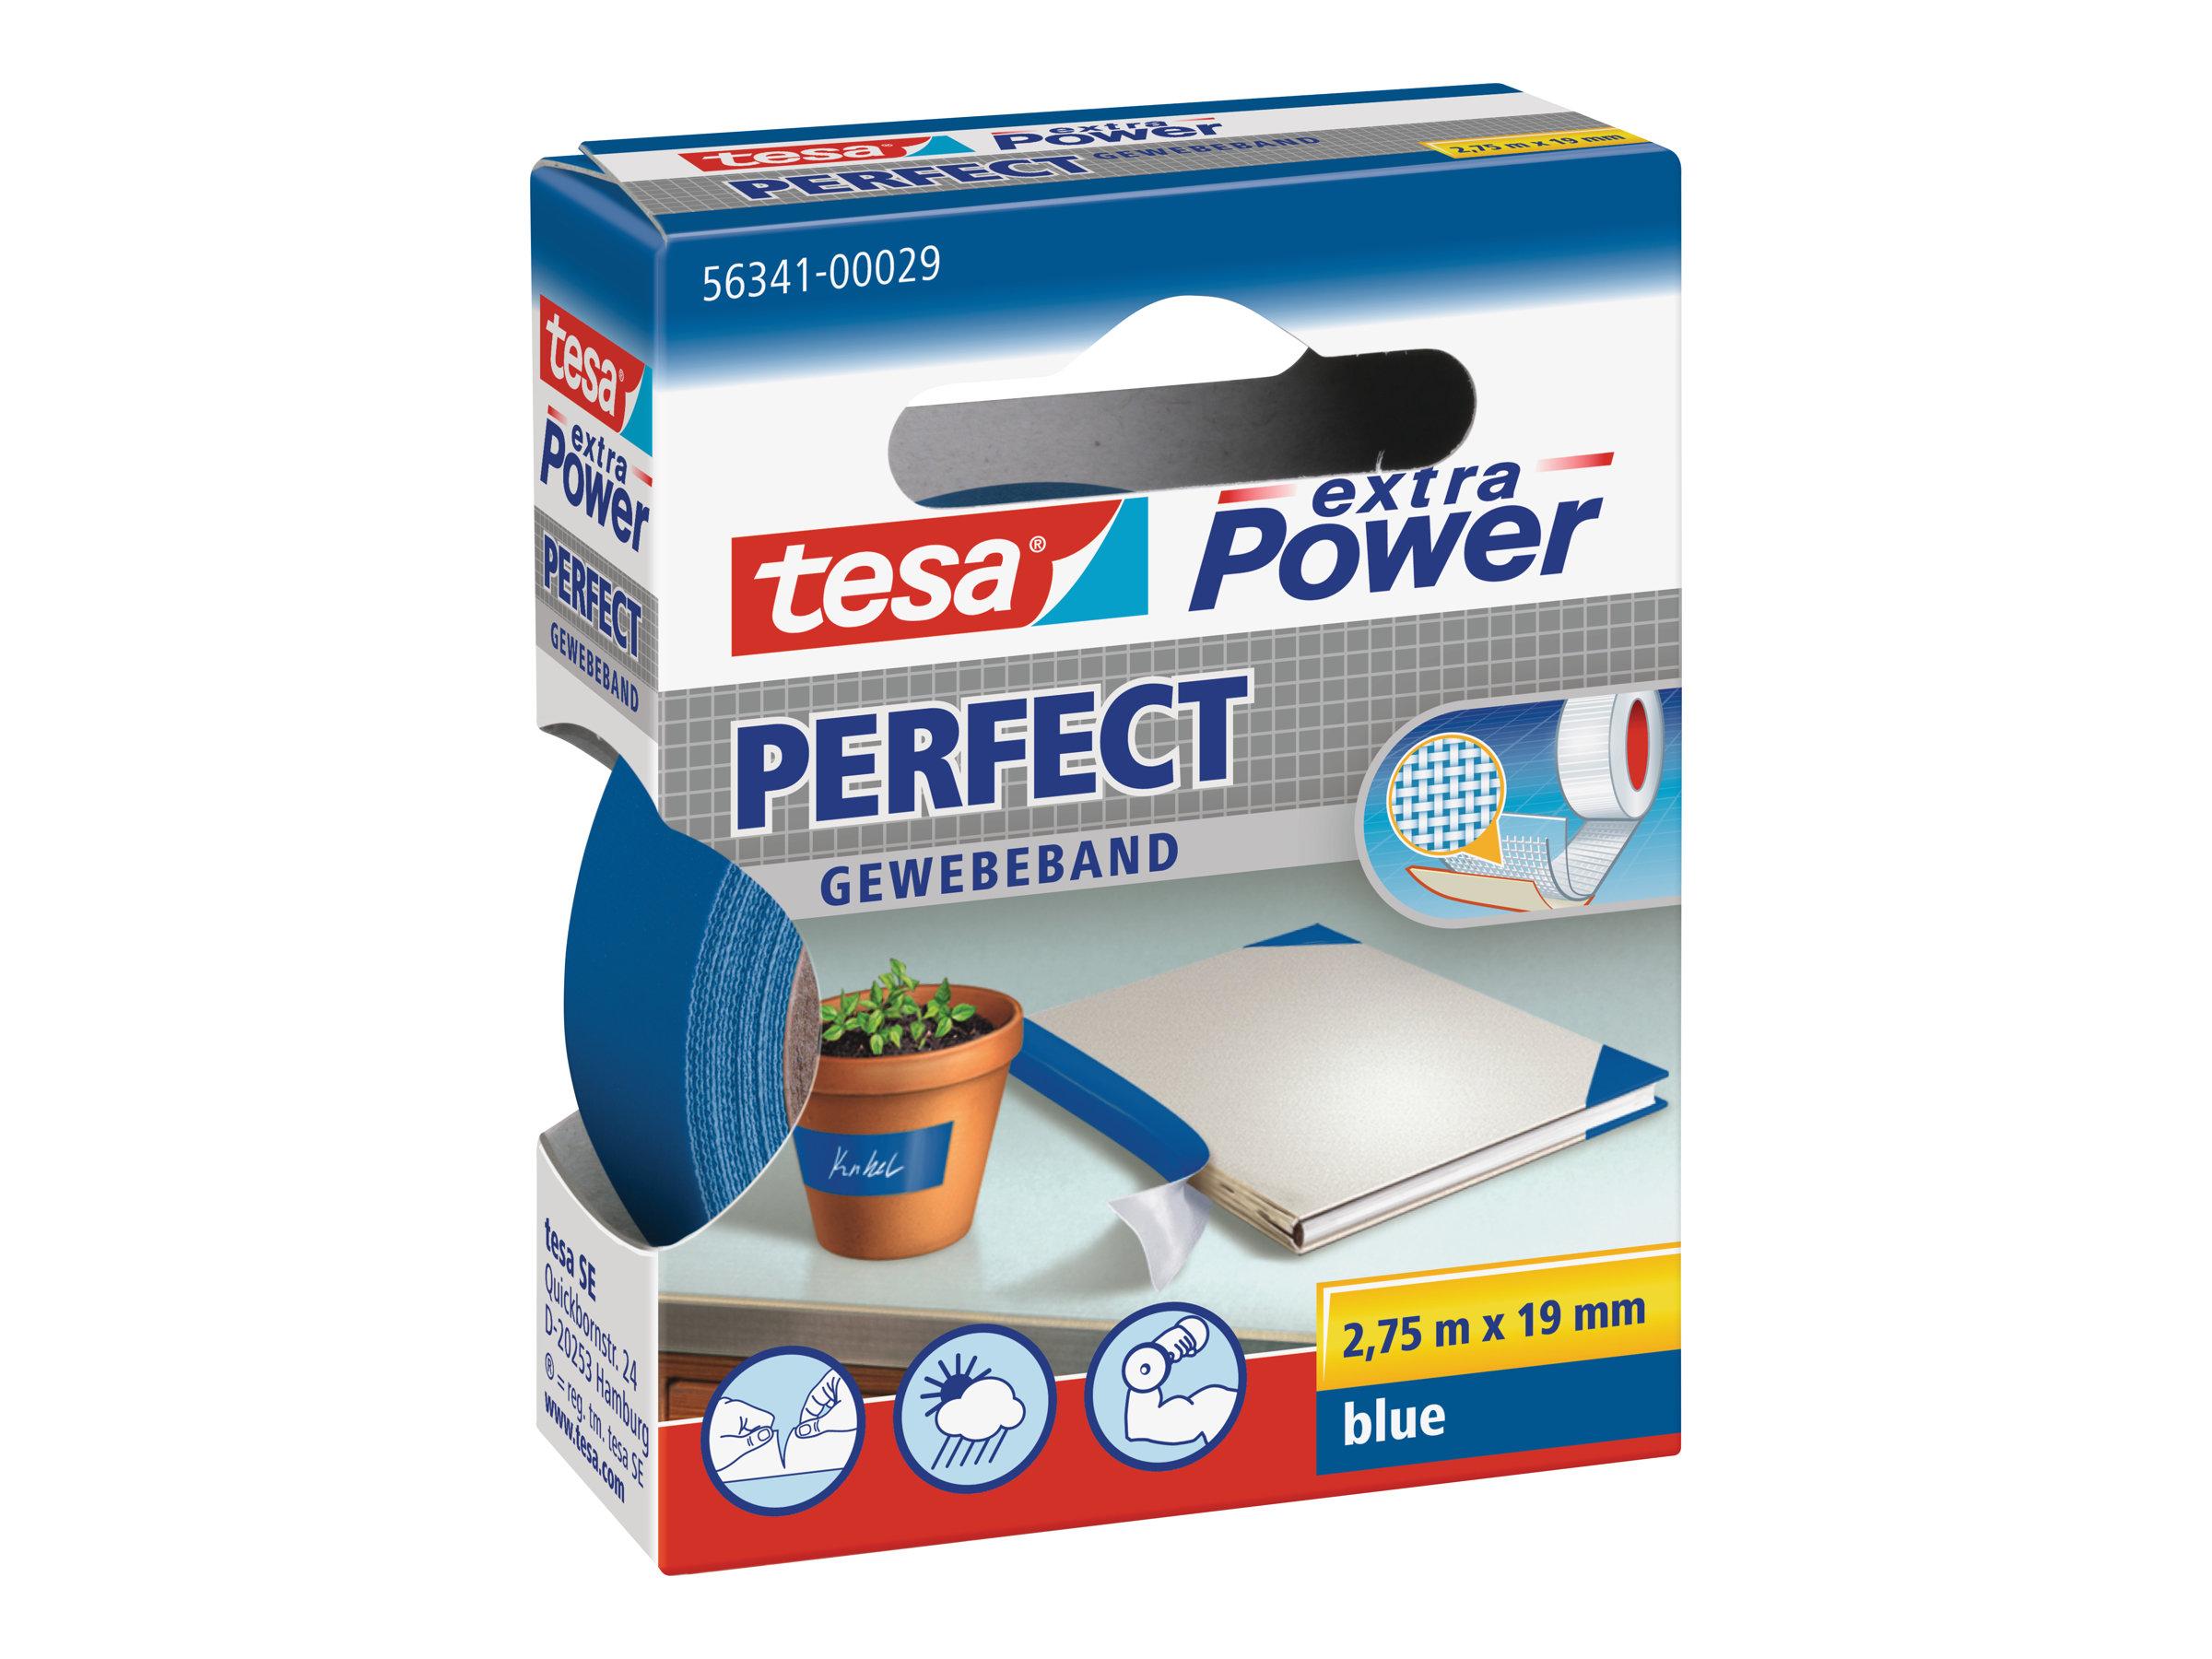 Tesa extra Power Perfect - Ruban adhésif en toile - 19 mm x 2.75 m - bleu